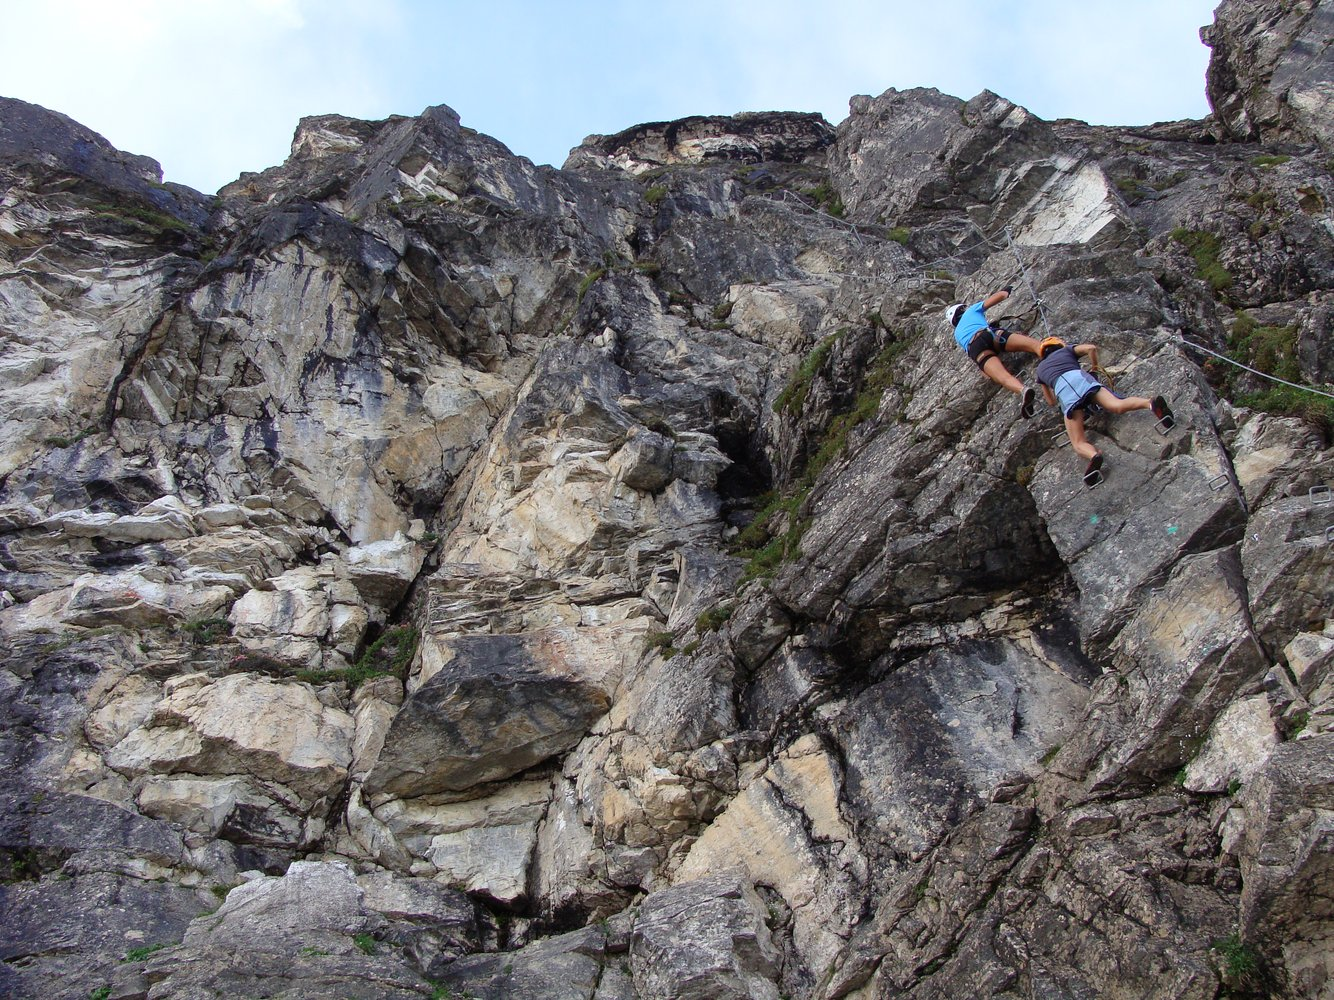 Klettersteig Gerlossteinwand : Gerlossteinwand klettersteig klettersteige